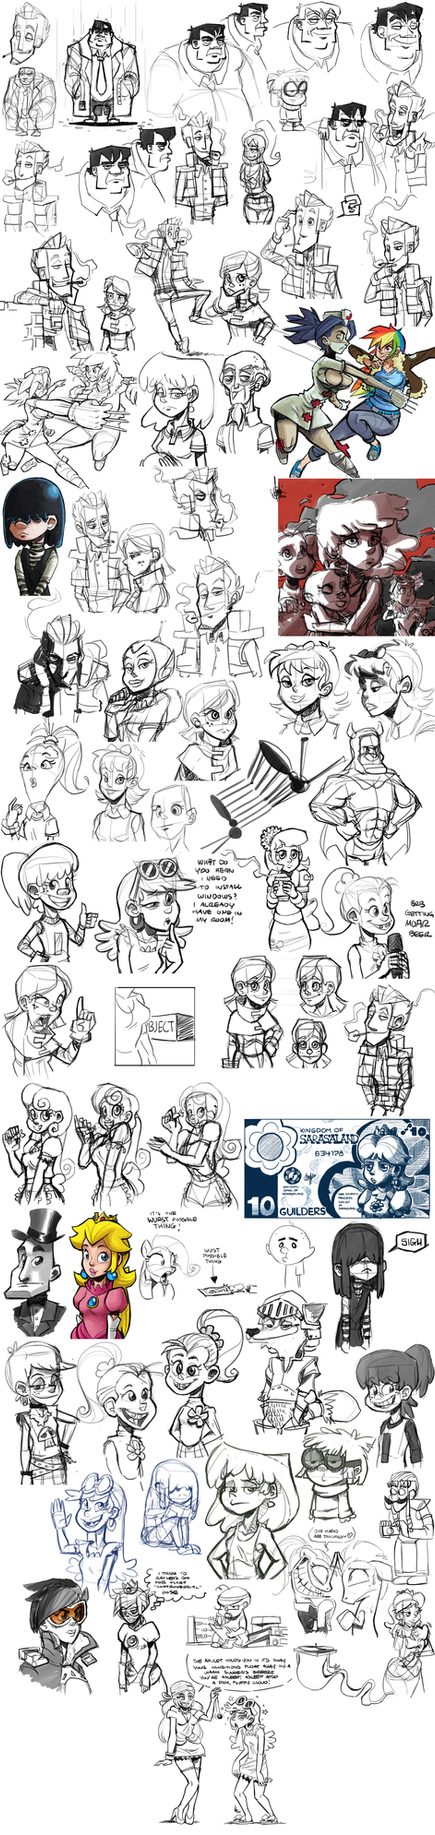 Sketch dump #28 by TheArtrix